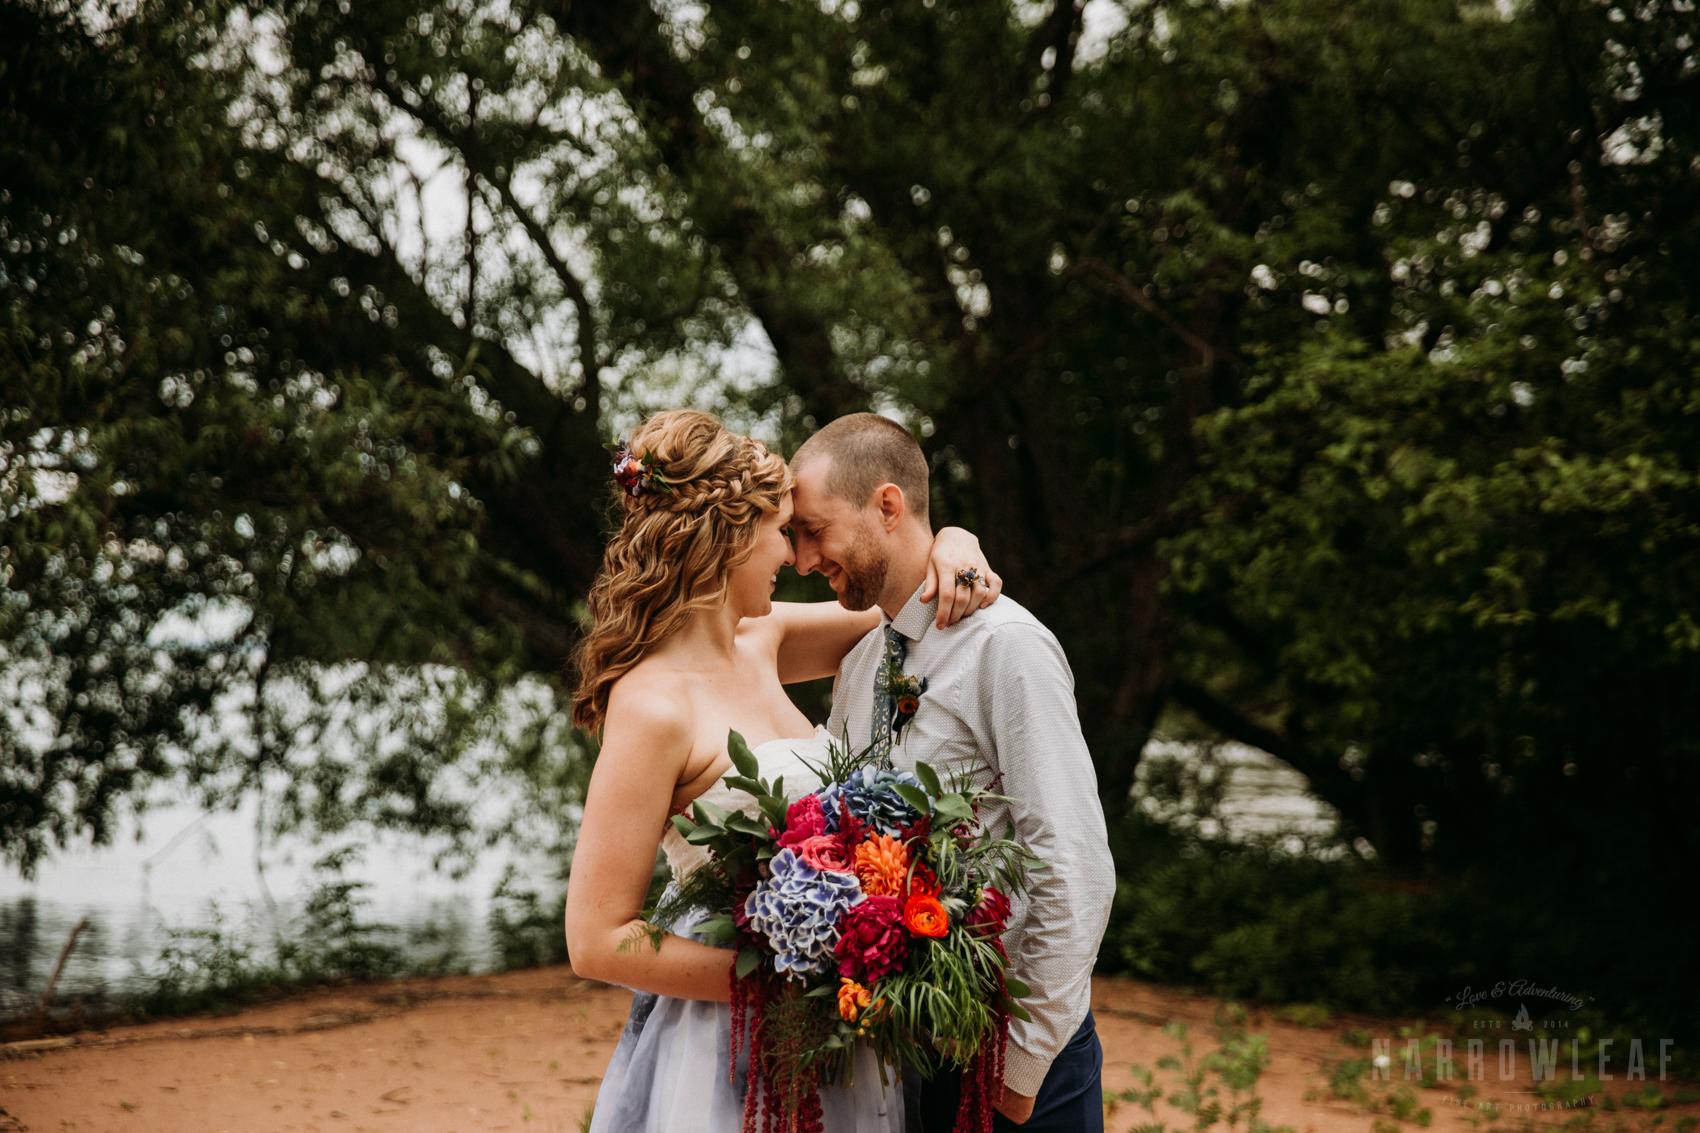 bayfield-wi-lake-superior-beach-wedding-bride-groom-intimate-photos-12.jpg